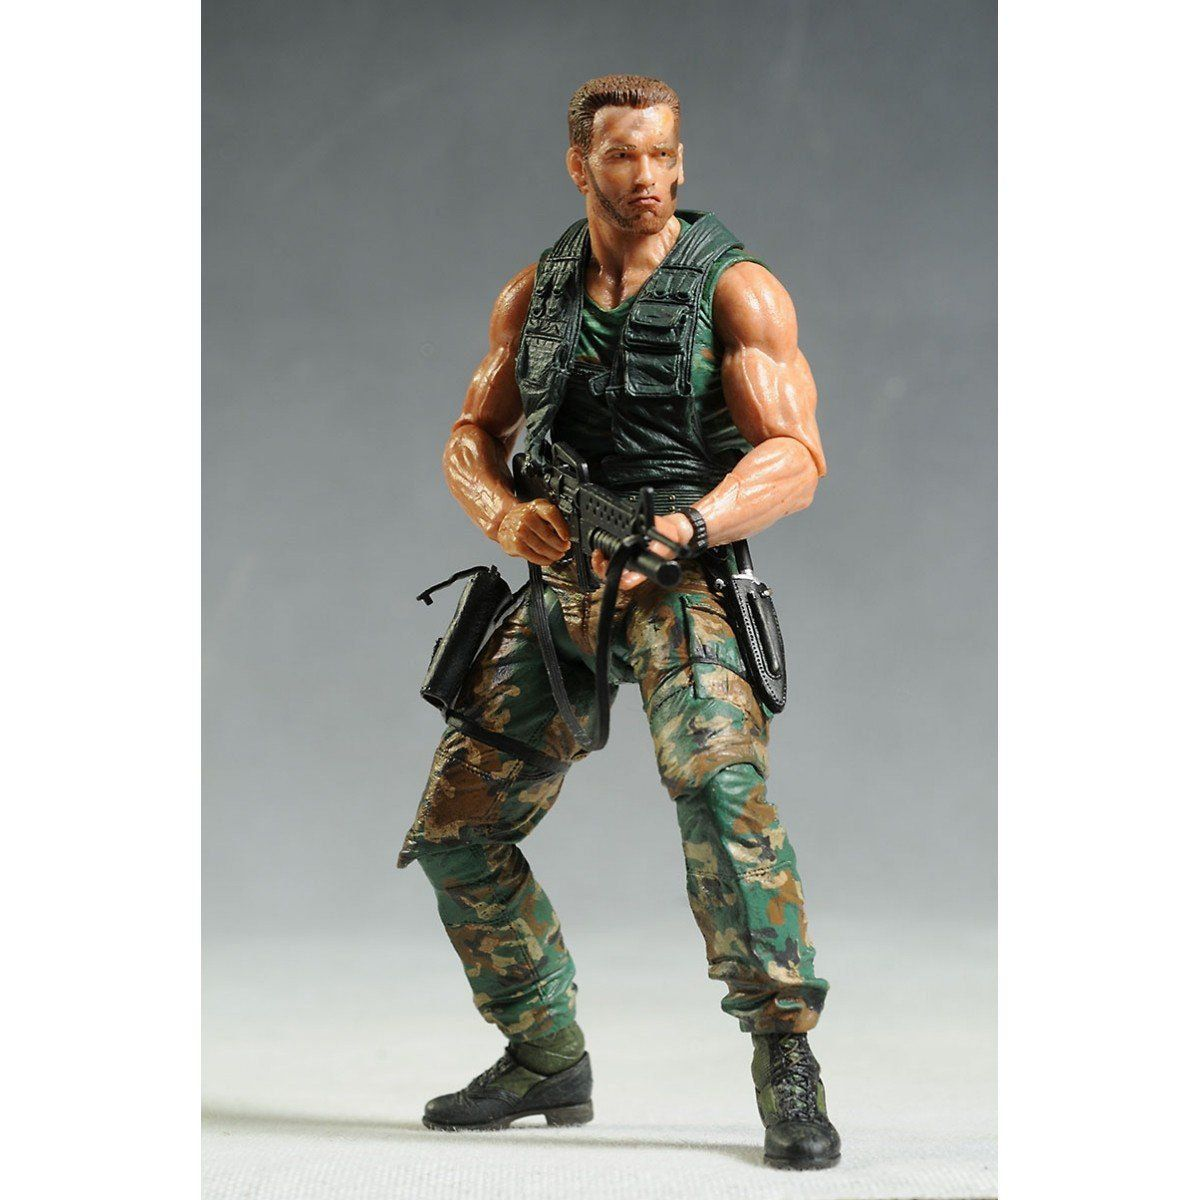 Boneco Jungle Patrol Dutch (Arnold Schwarzenegger): Predador / Predator 1987 30th Anniversary Series 9 - NECA